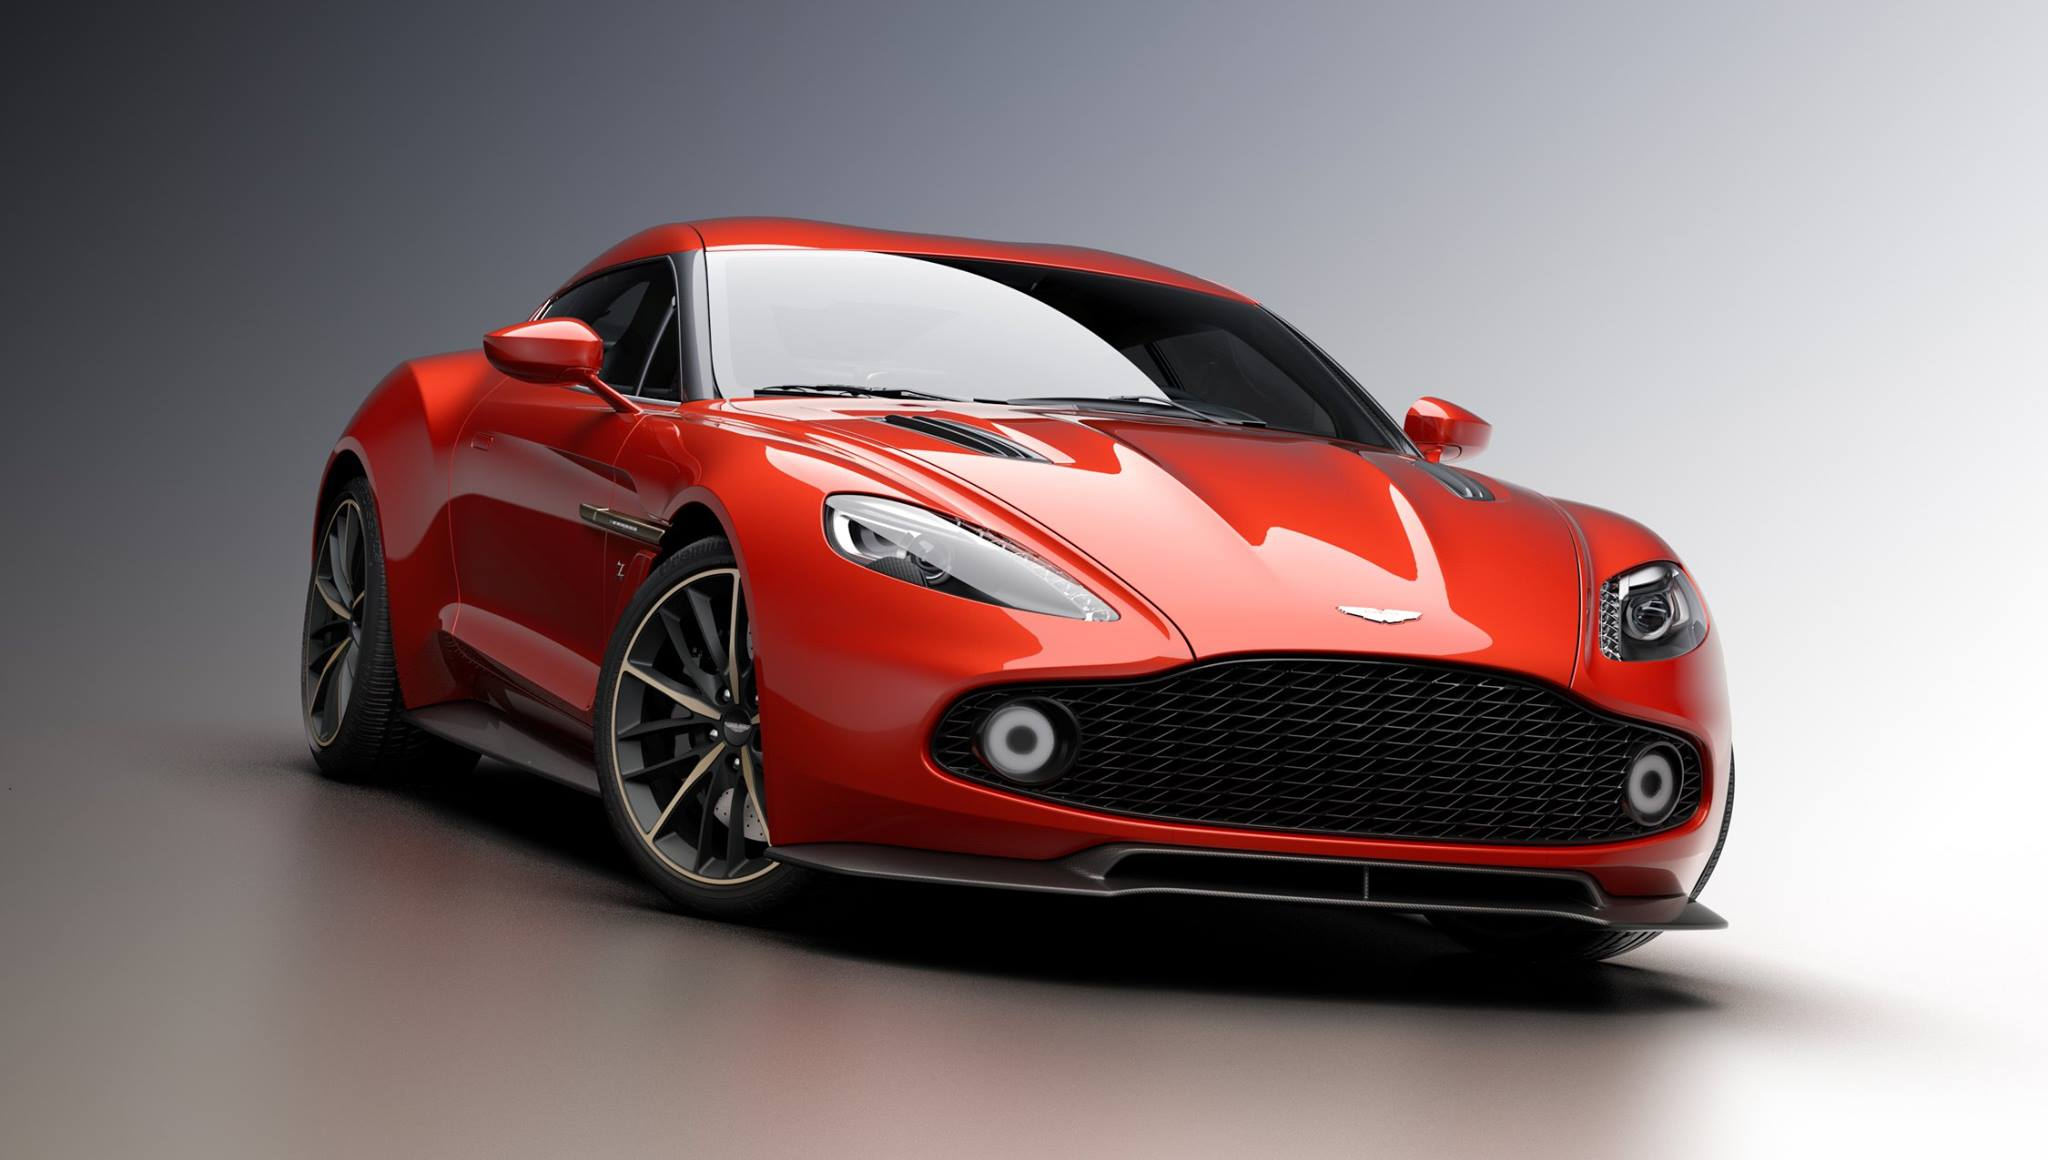 Aston Martin Vanquish Zagato Hd Wallpapers 7wallpapers Net